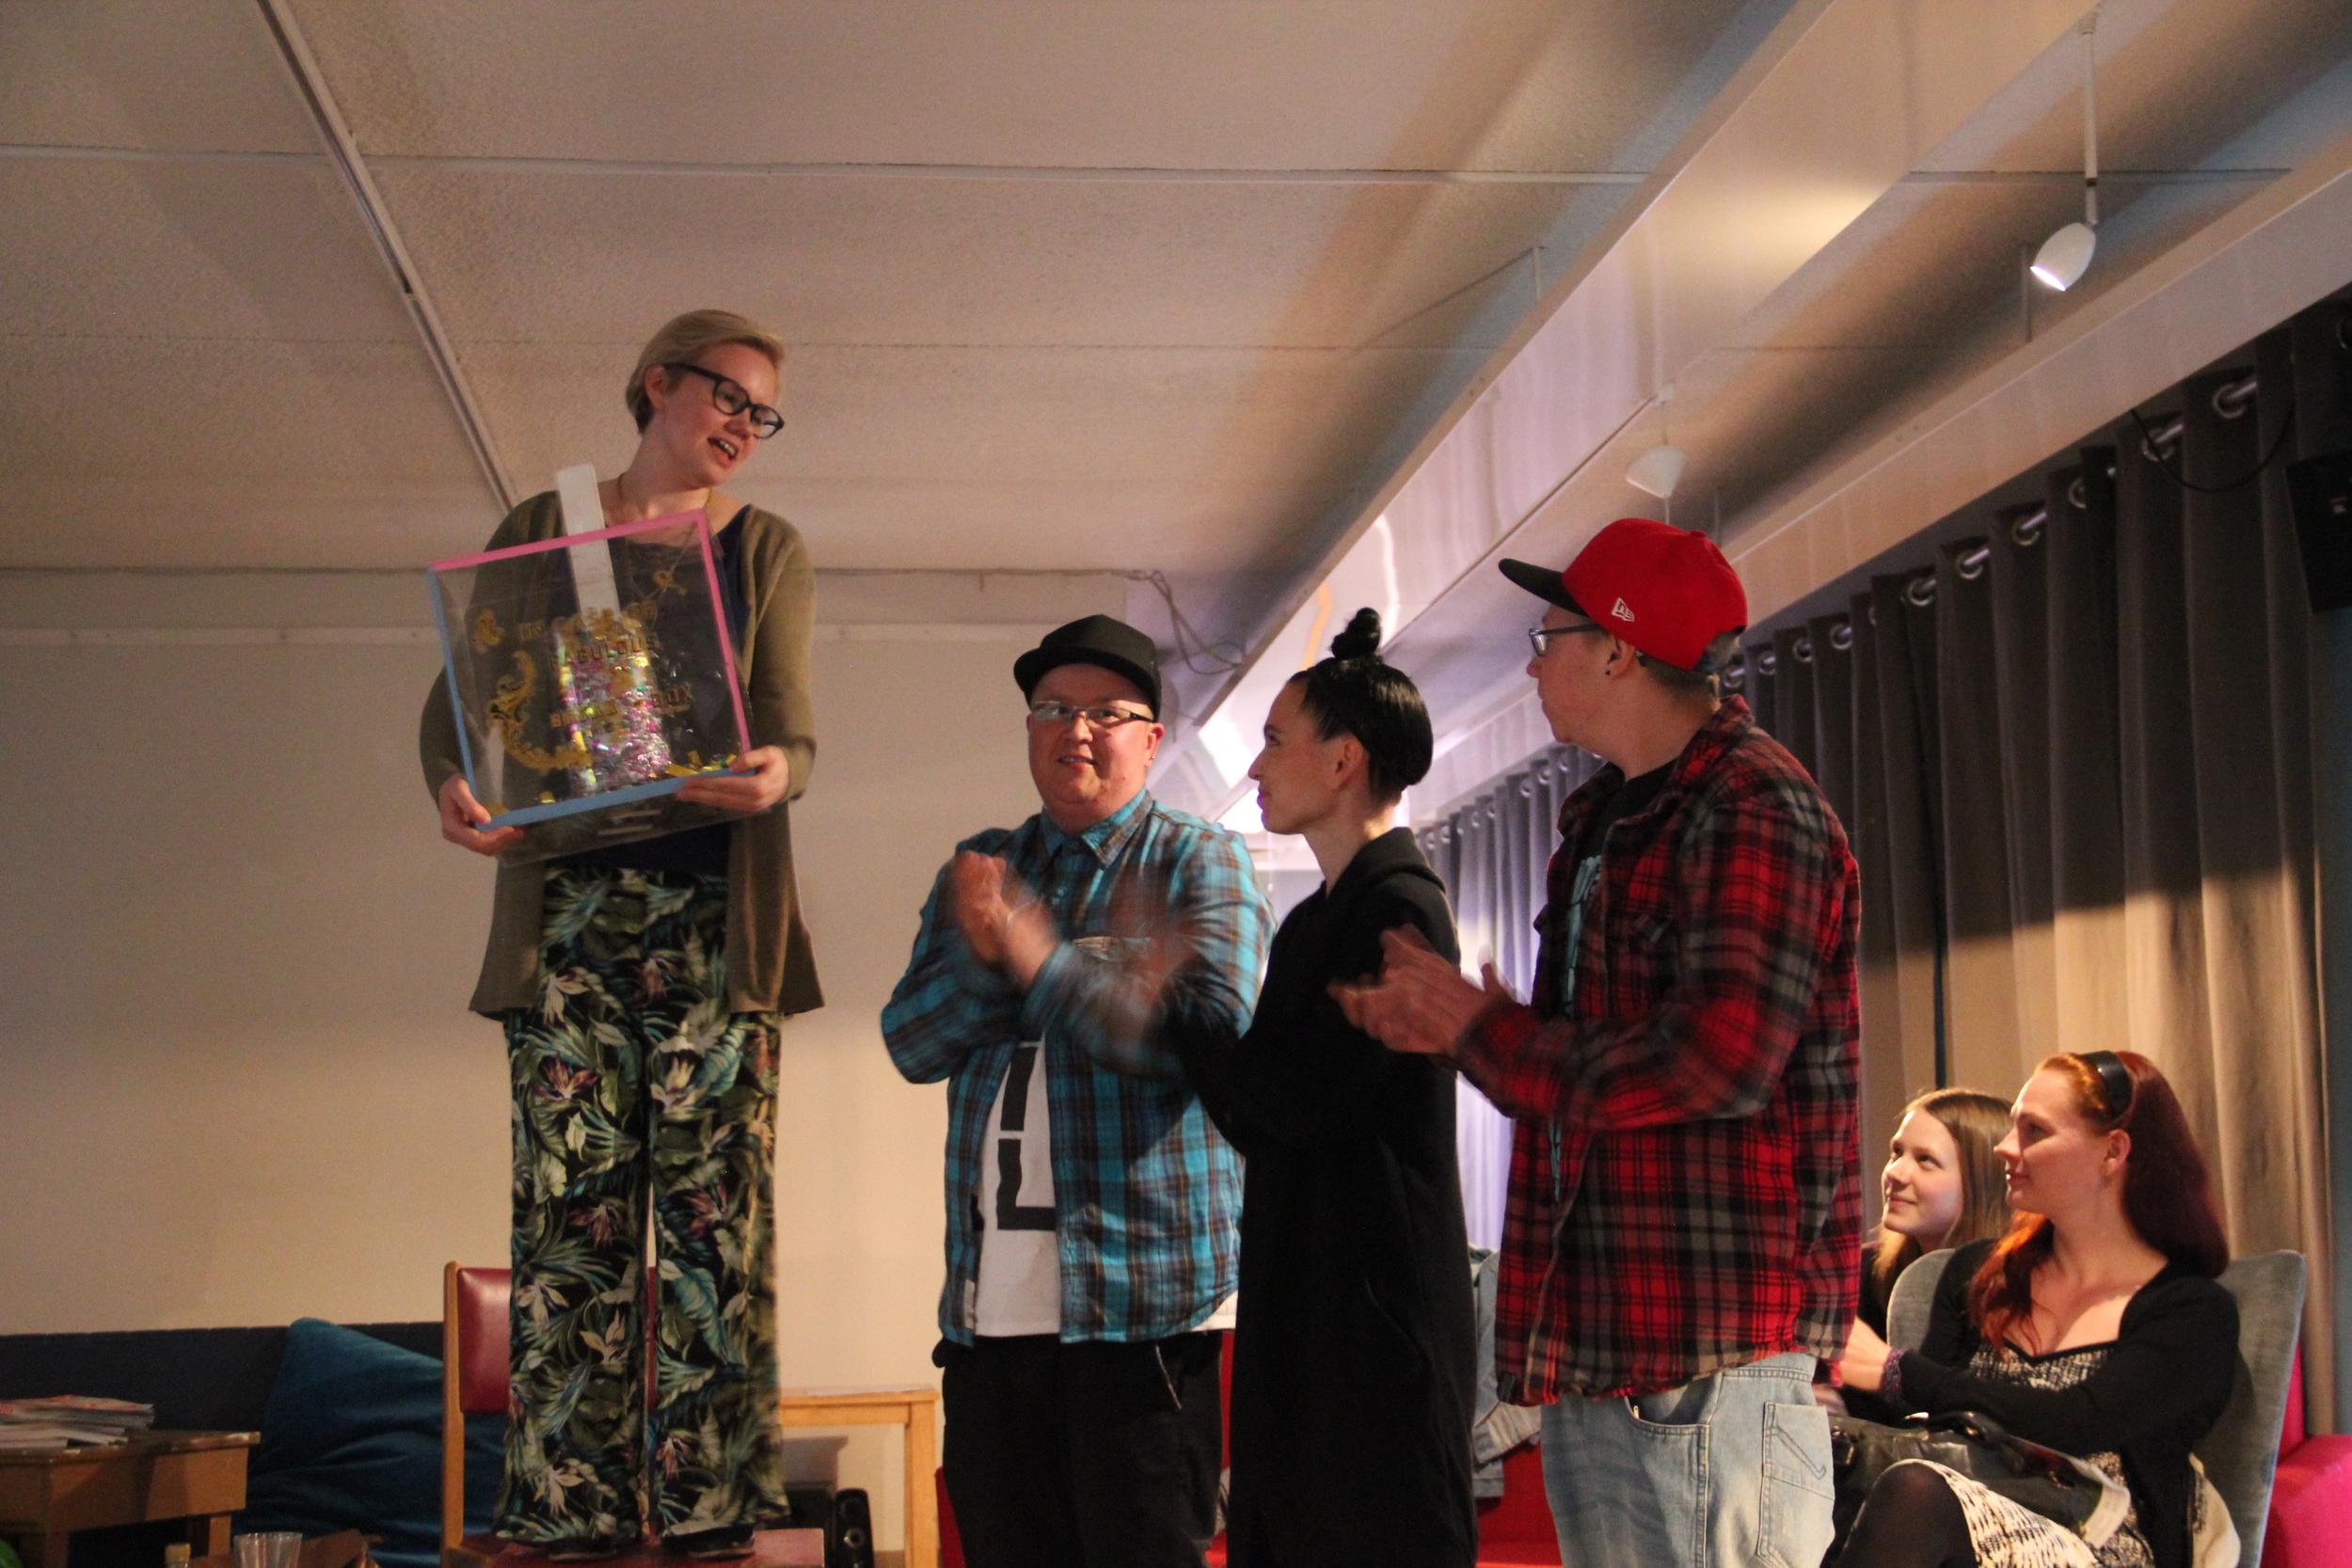 Transforces gave the In Case Of Fabulous - Break The Box piece to Hki Pride's fabulous Minna Kalenius, 2015